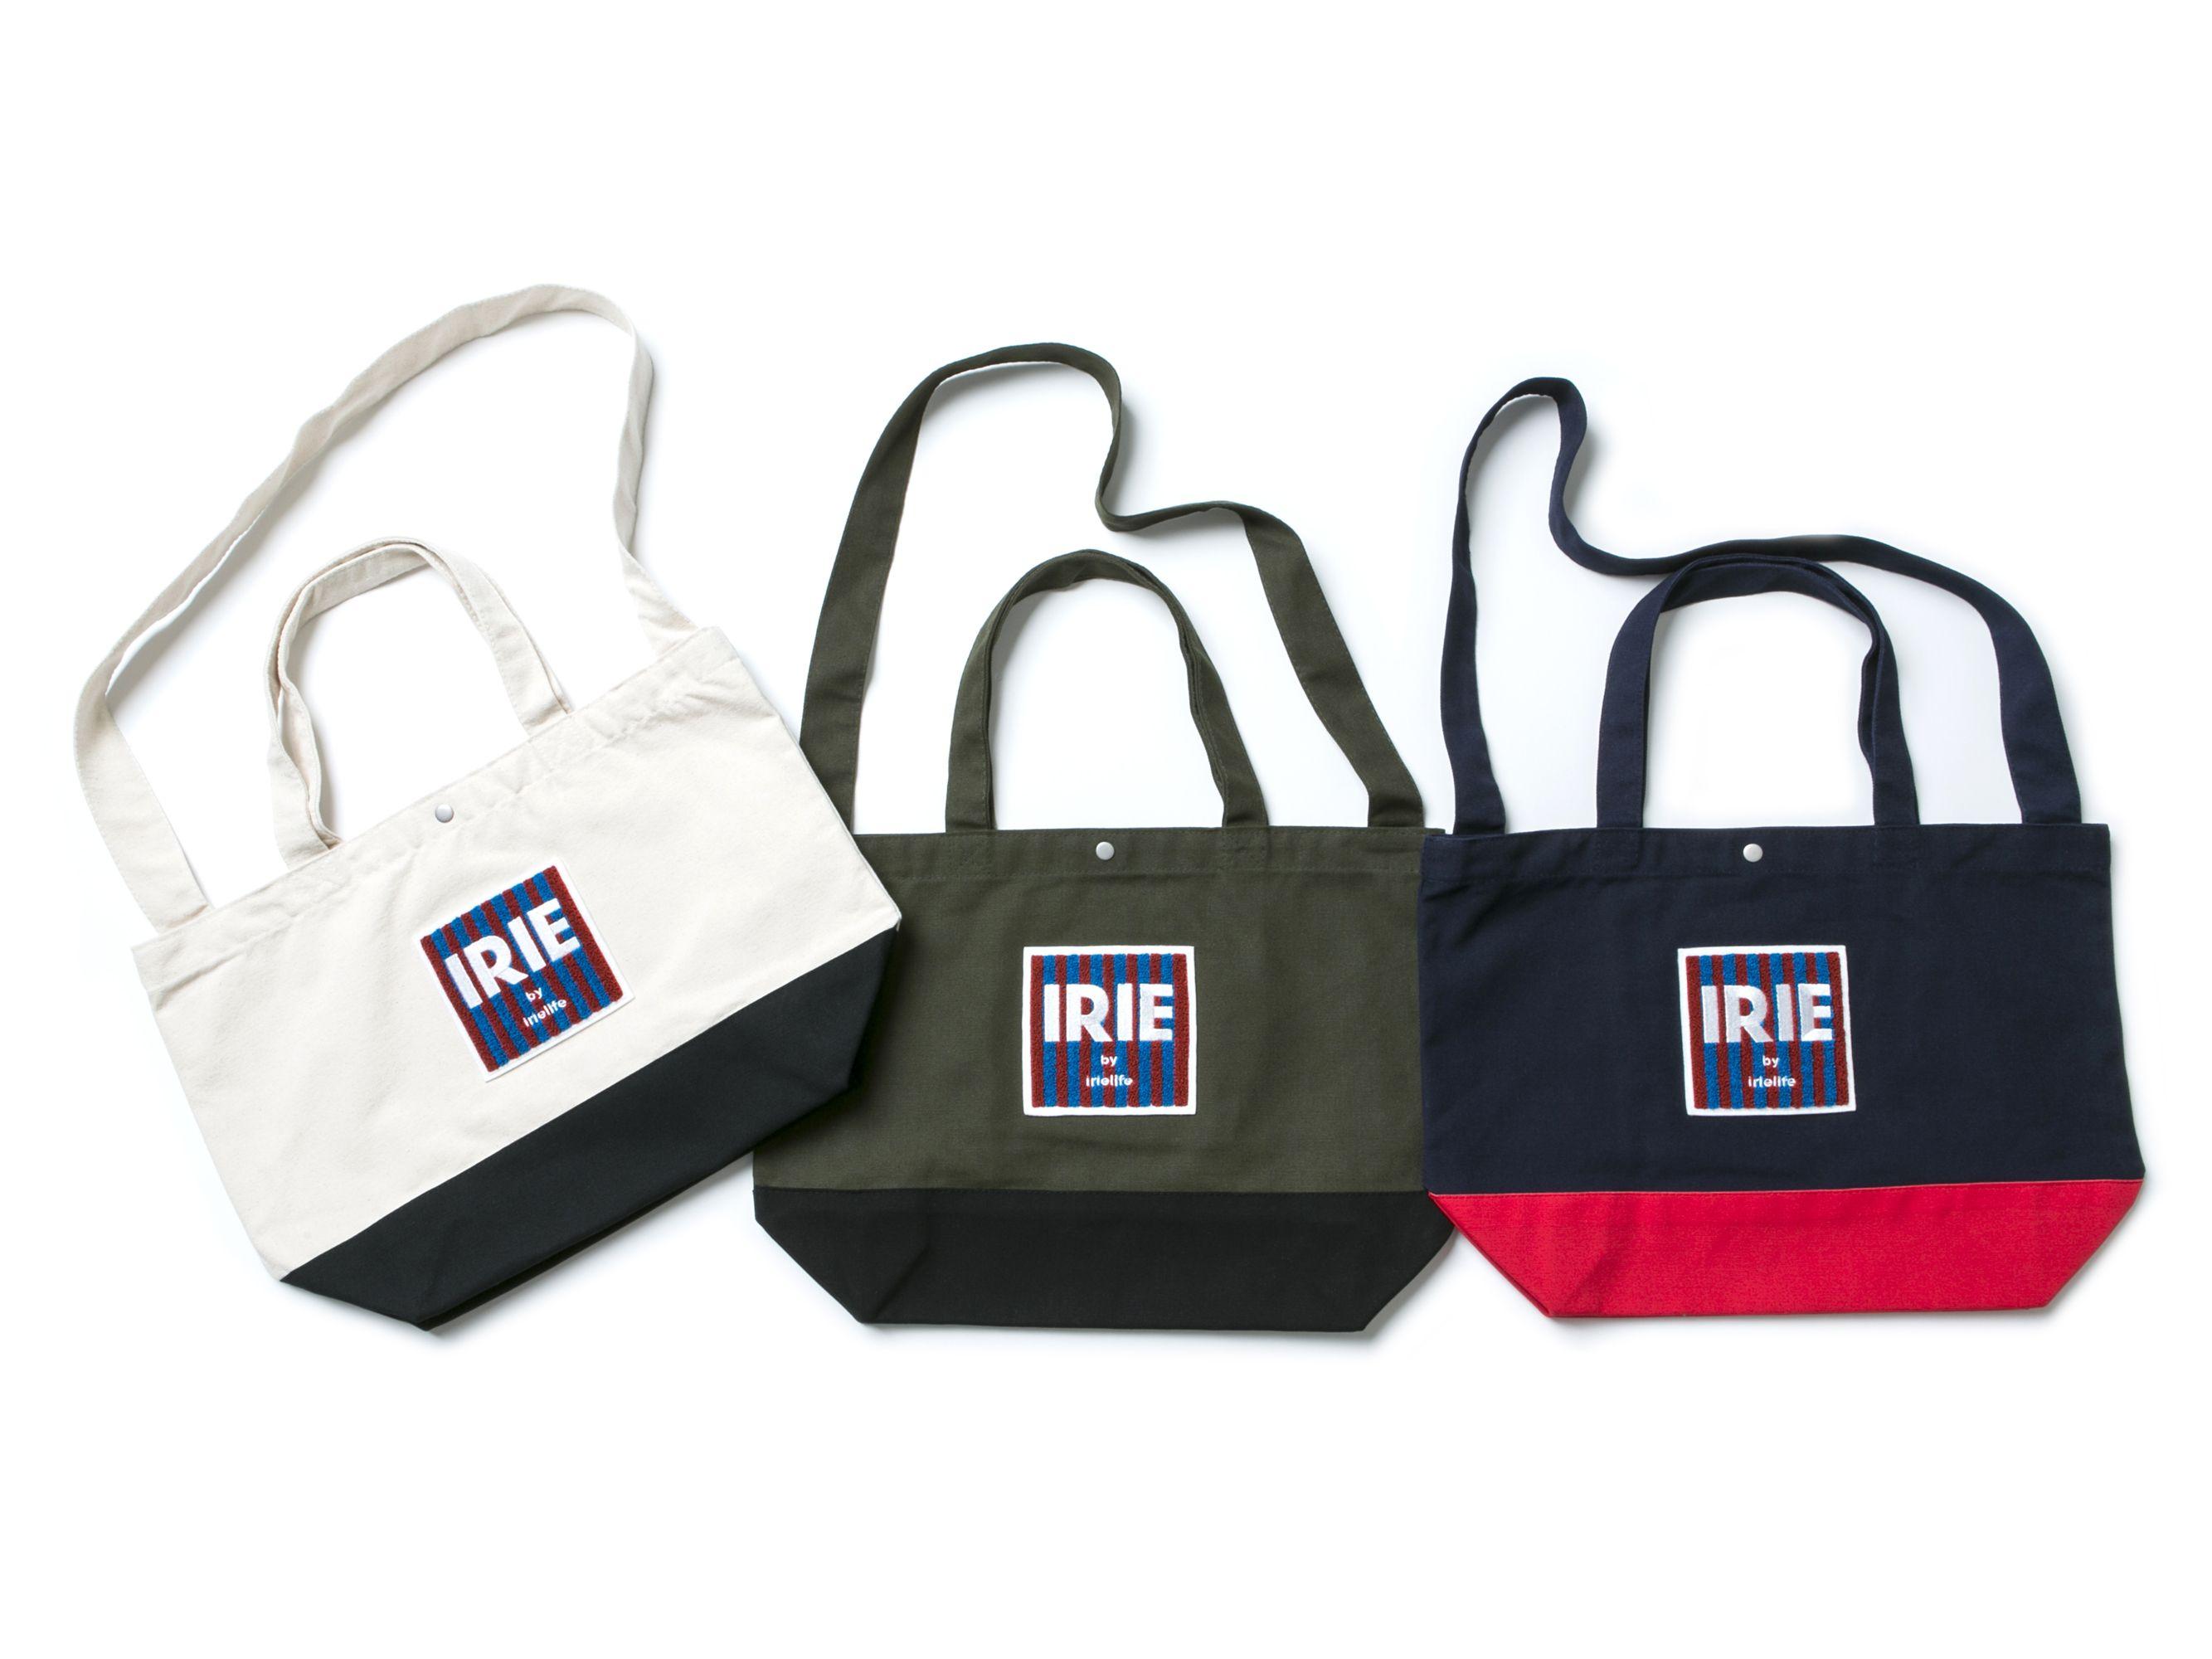 【SALE 30% OFF】 IRIE SAGARA LOGO TOTE BAG -IRIEby irielife-